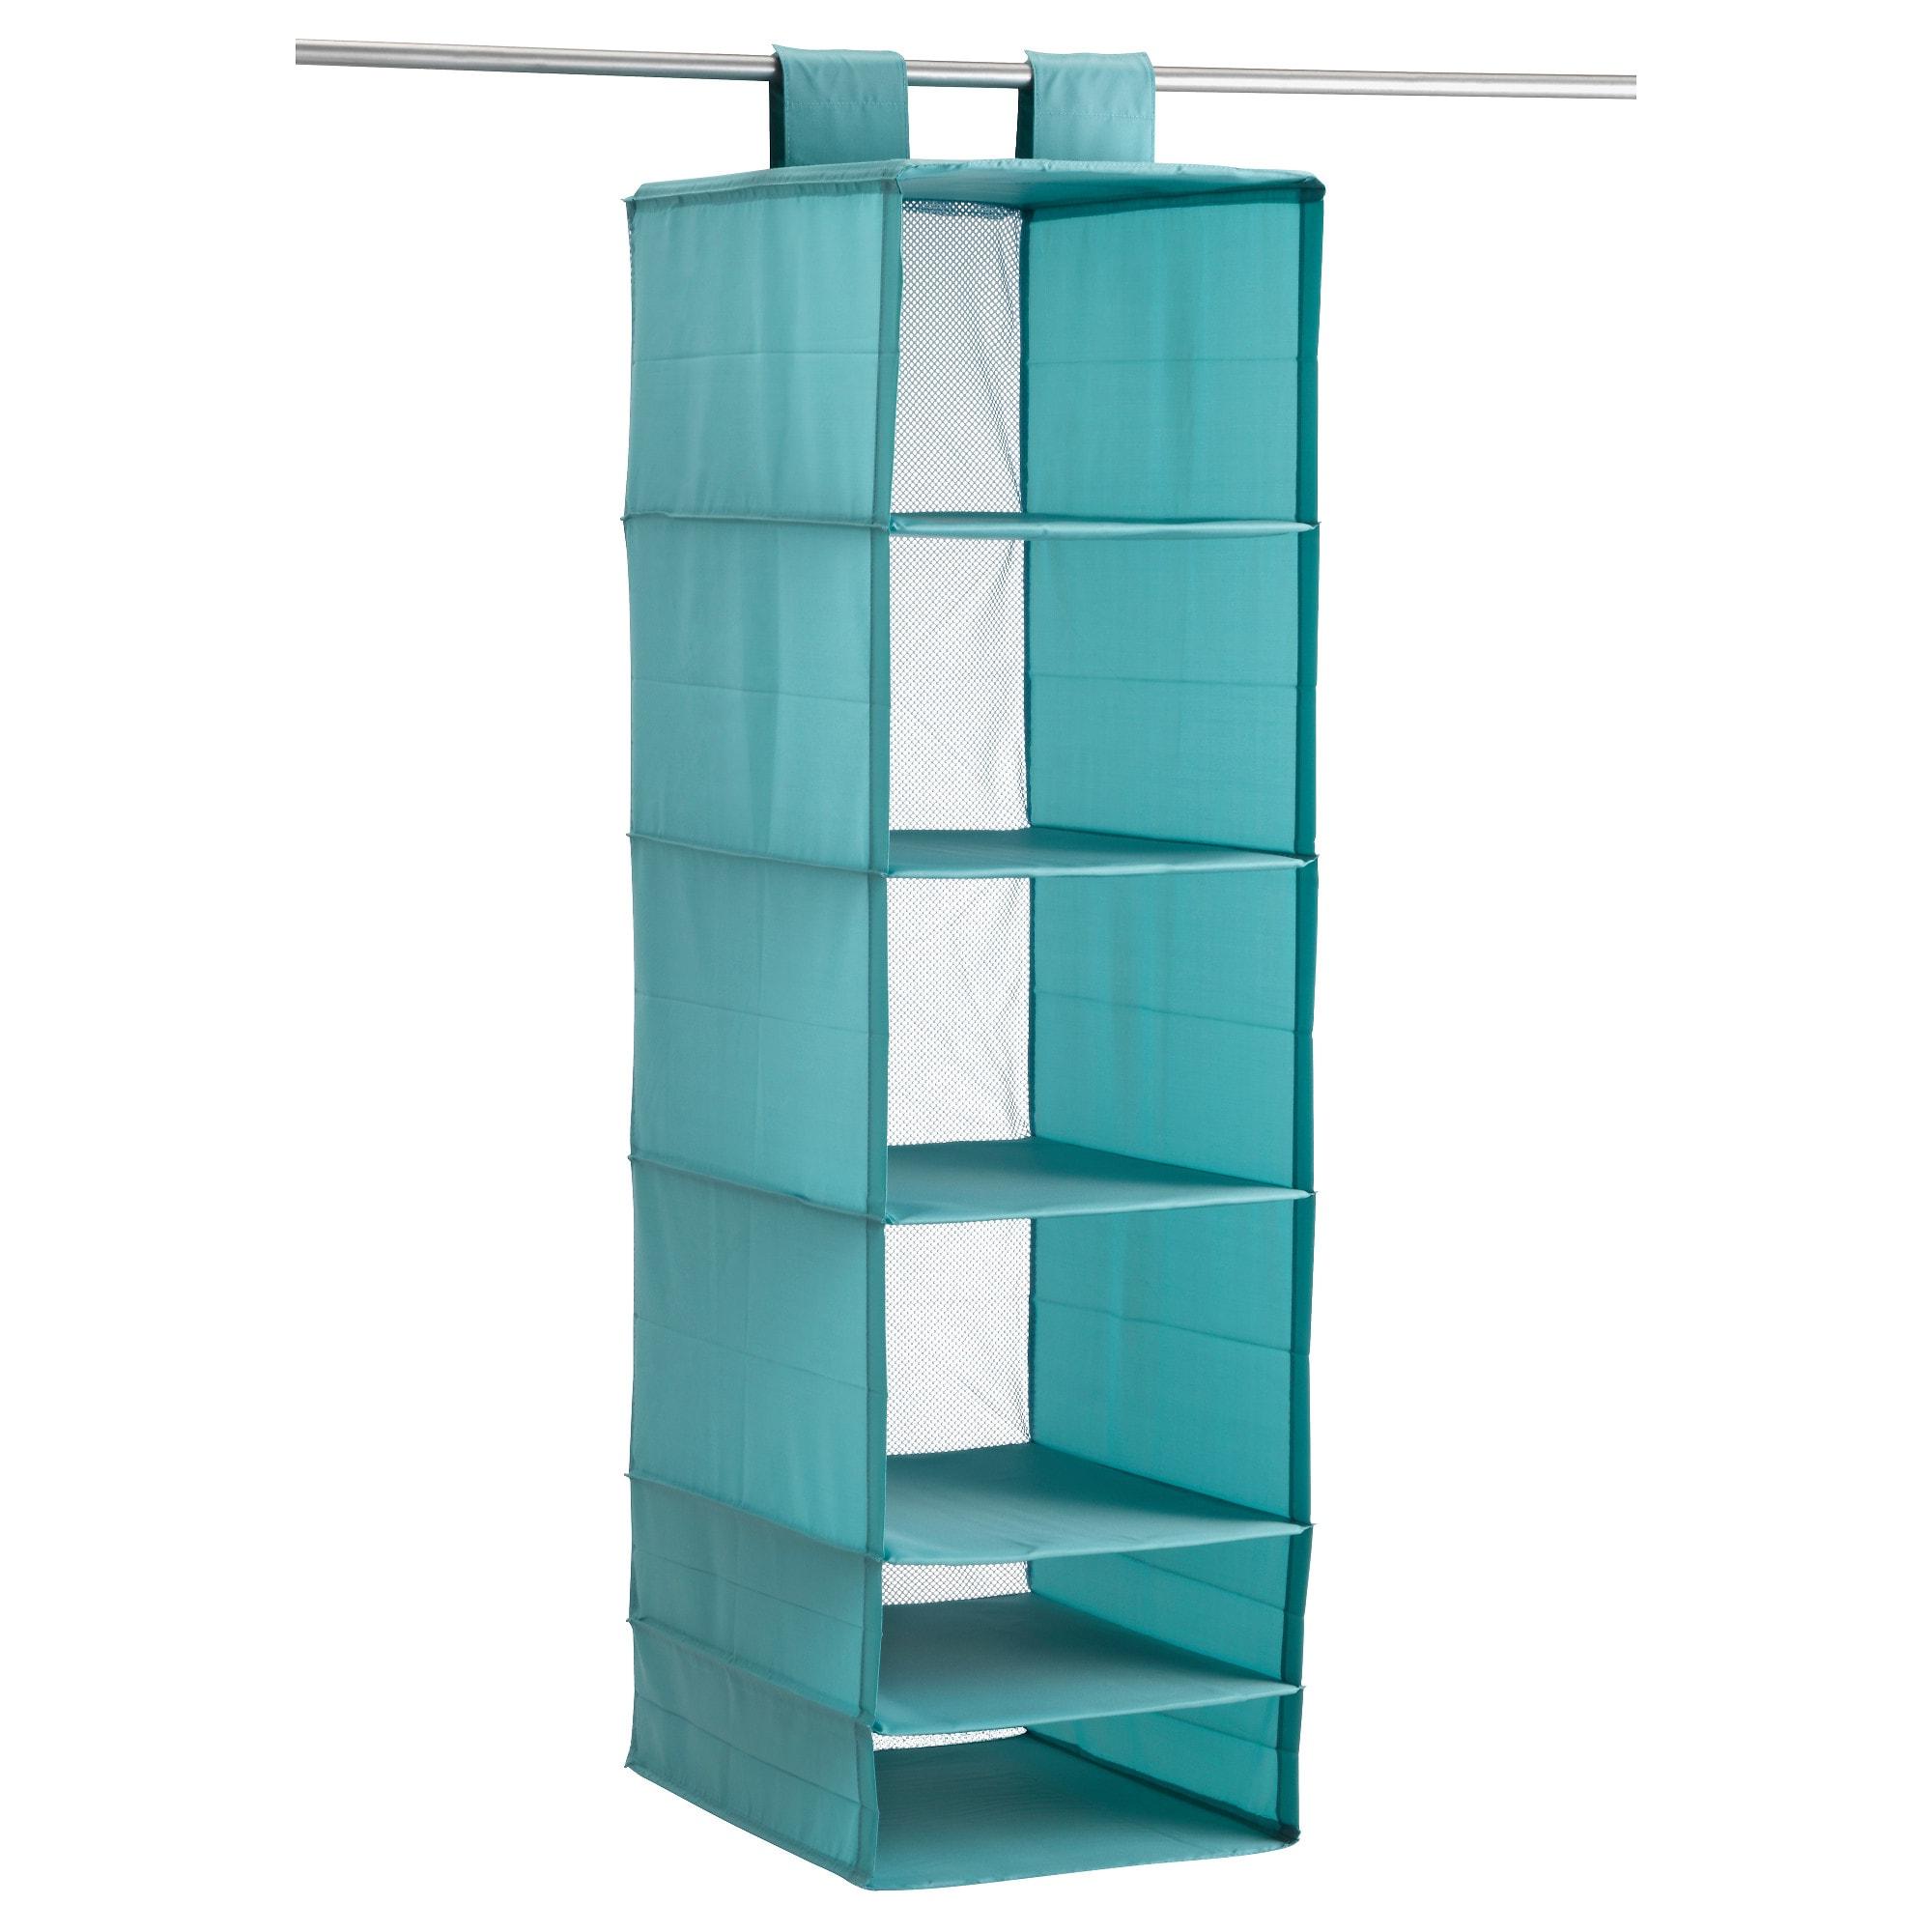 Organizador De Armarios Ikea Txdf Skubb Almacenaje 6 Part Azul Claro 35 X 45 X 125 Cm Ikea